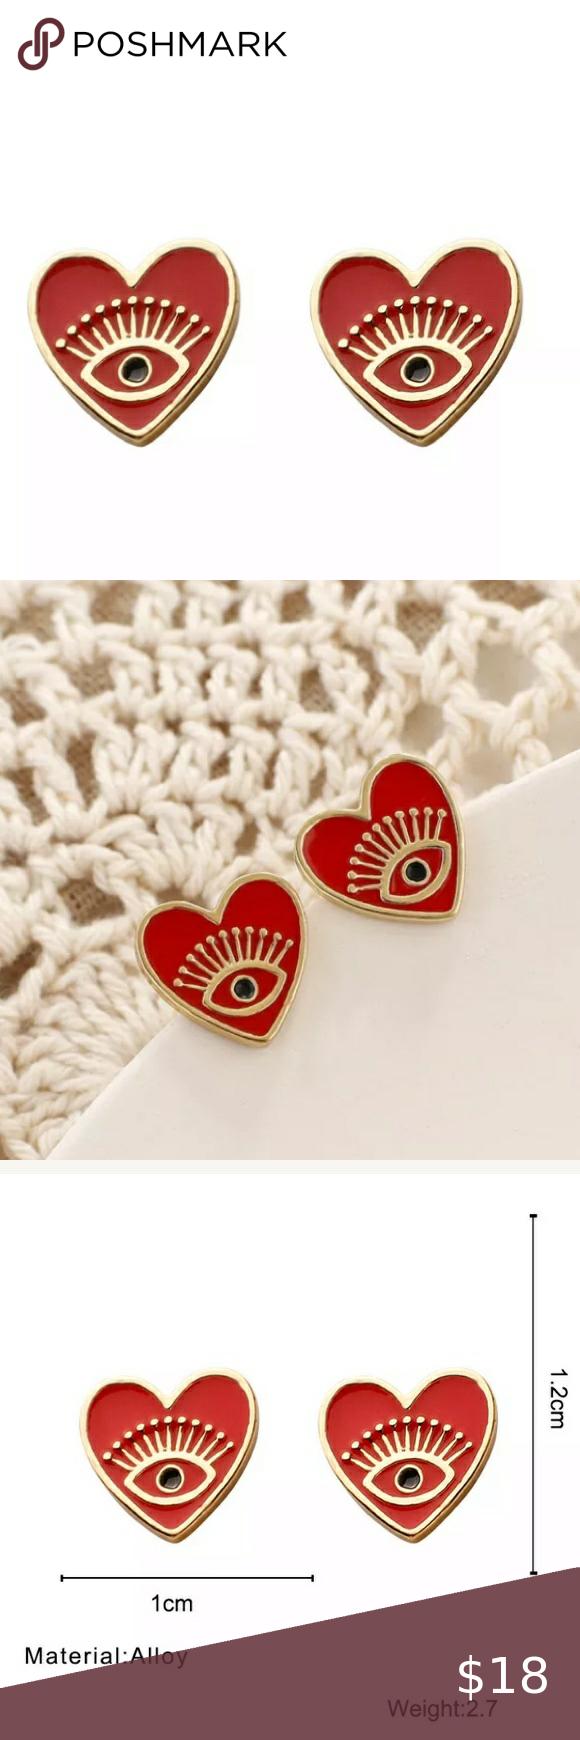 Photo of ❤️Heart & Eye Stud Earrings Super cute heart stud earrings featuring gold ry…